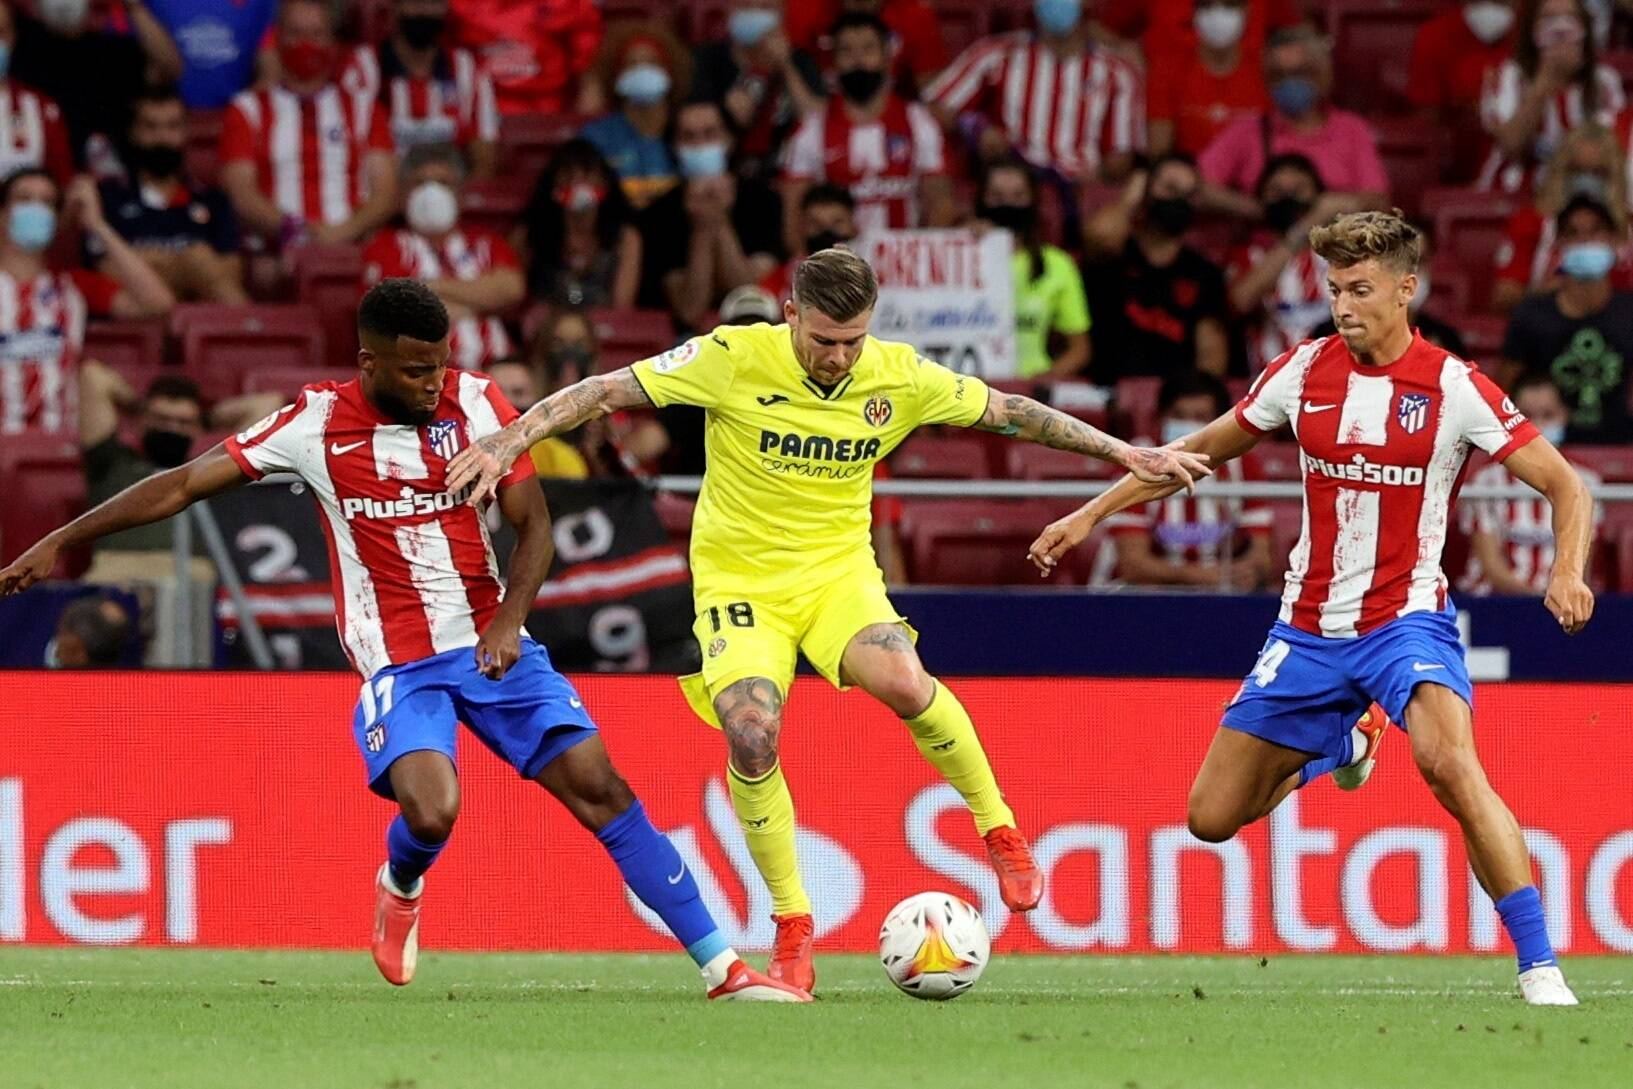 La Liga | Kurioses Eigentor in letzter Sekunde: Atletico rettet einen Punkt gegen Villarreal